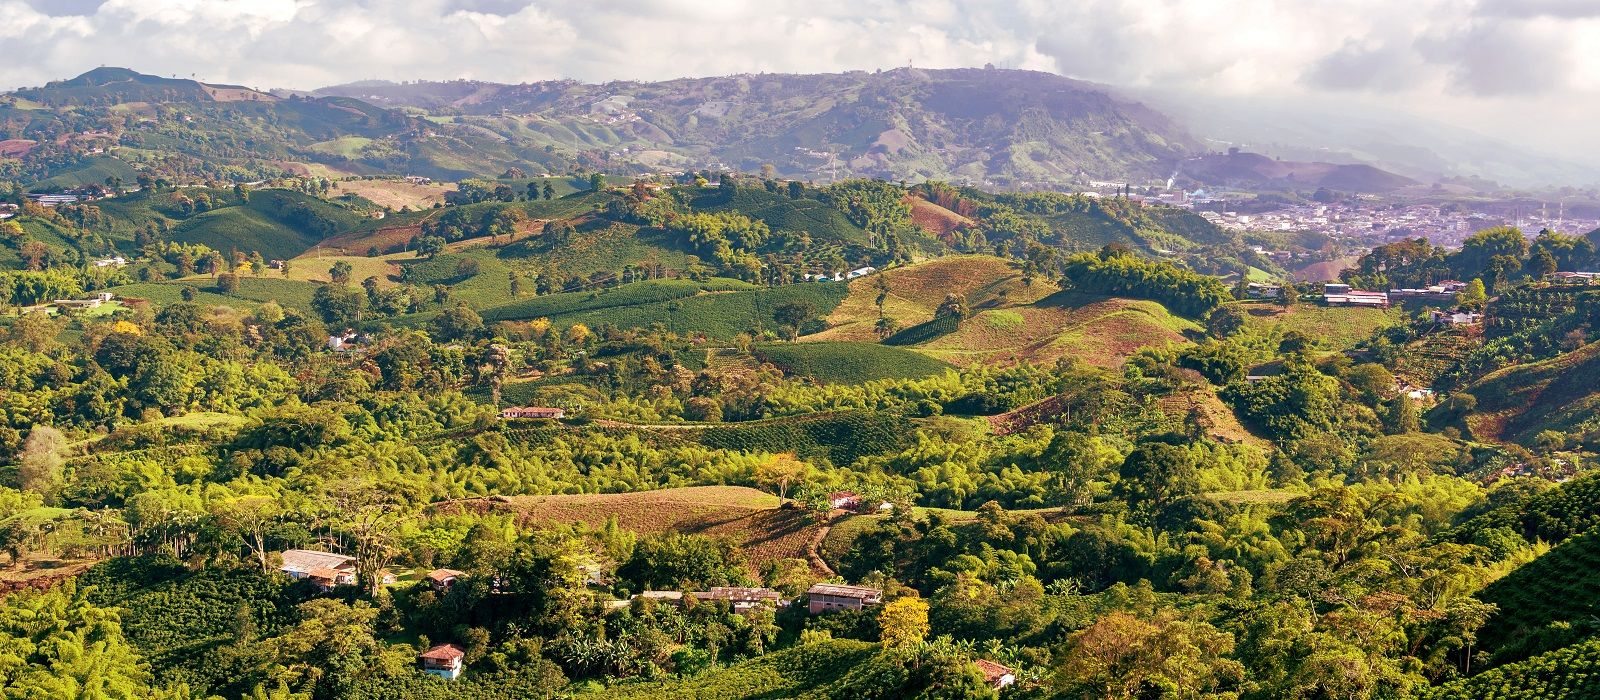 Destination Coffee Region Colombia